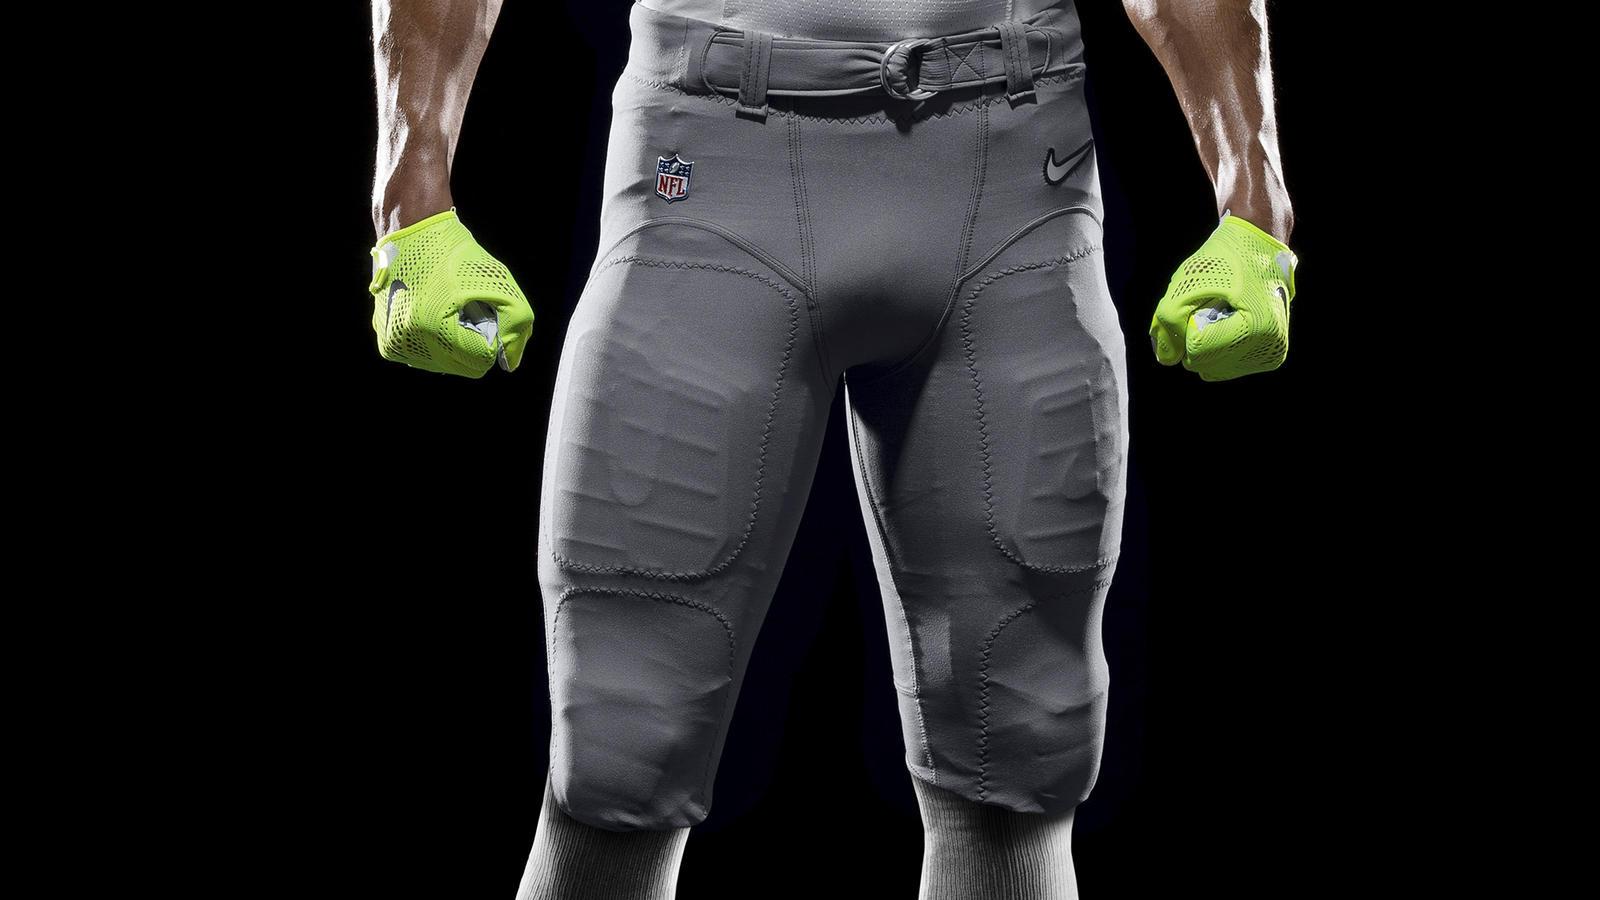 SP14_NFL_SB_TeamUni_AFC_4650_PR_crop_1